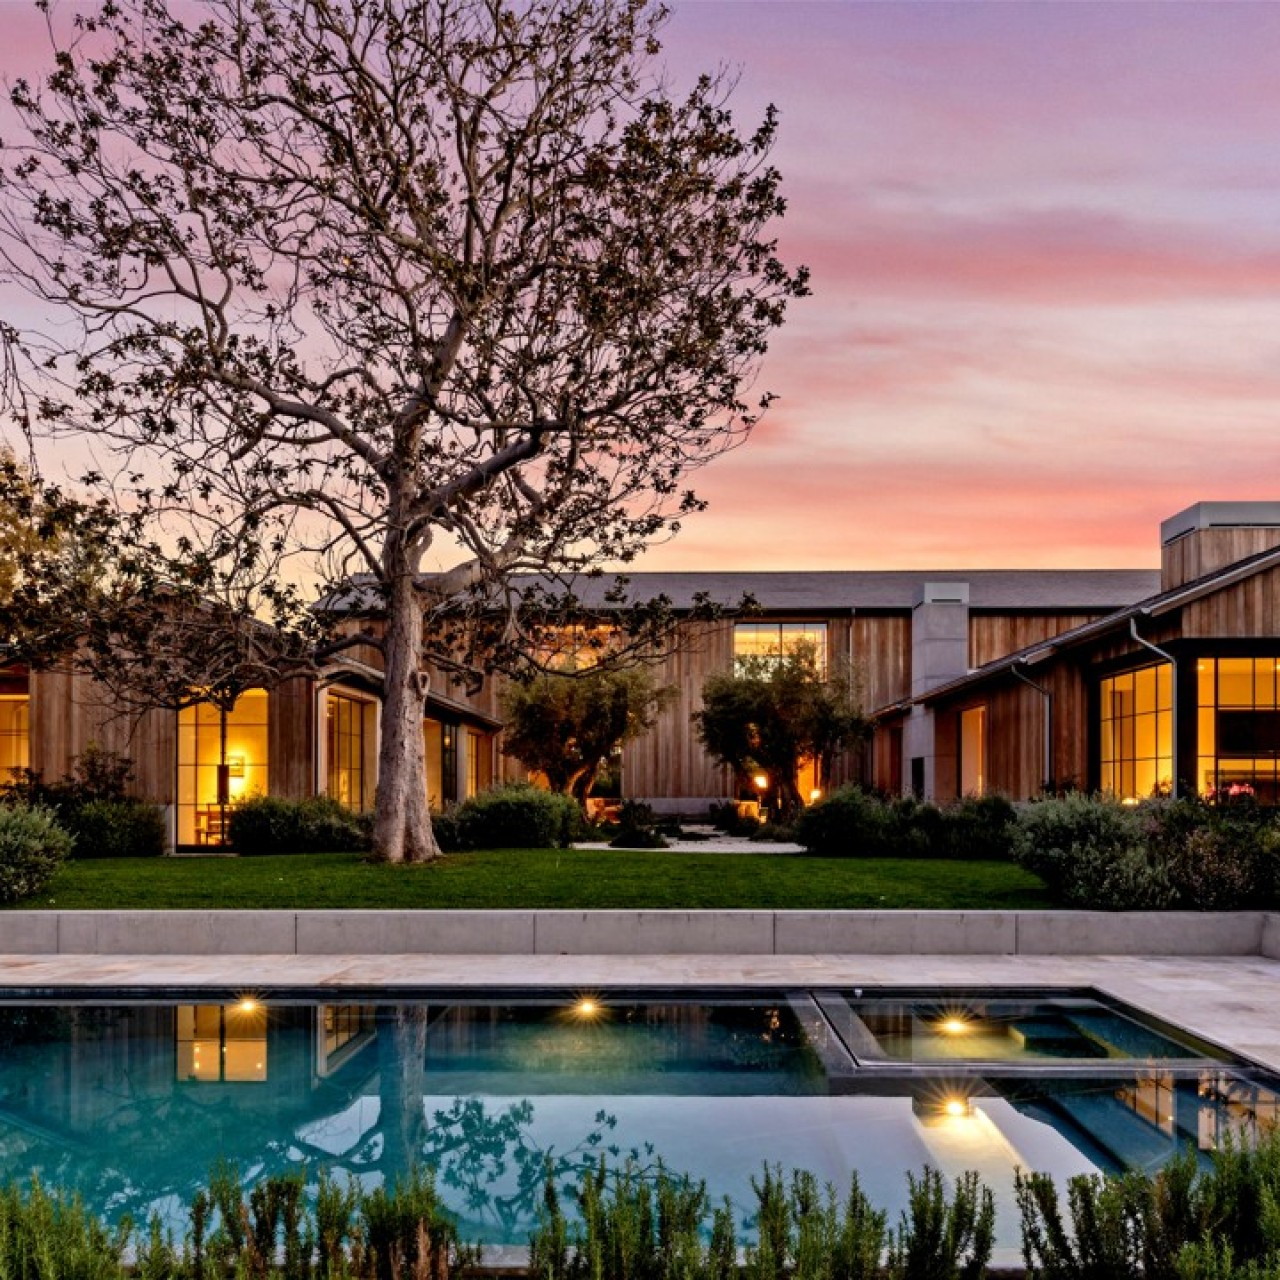 Hot property: billionaire pays US$85 million for Malibu